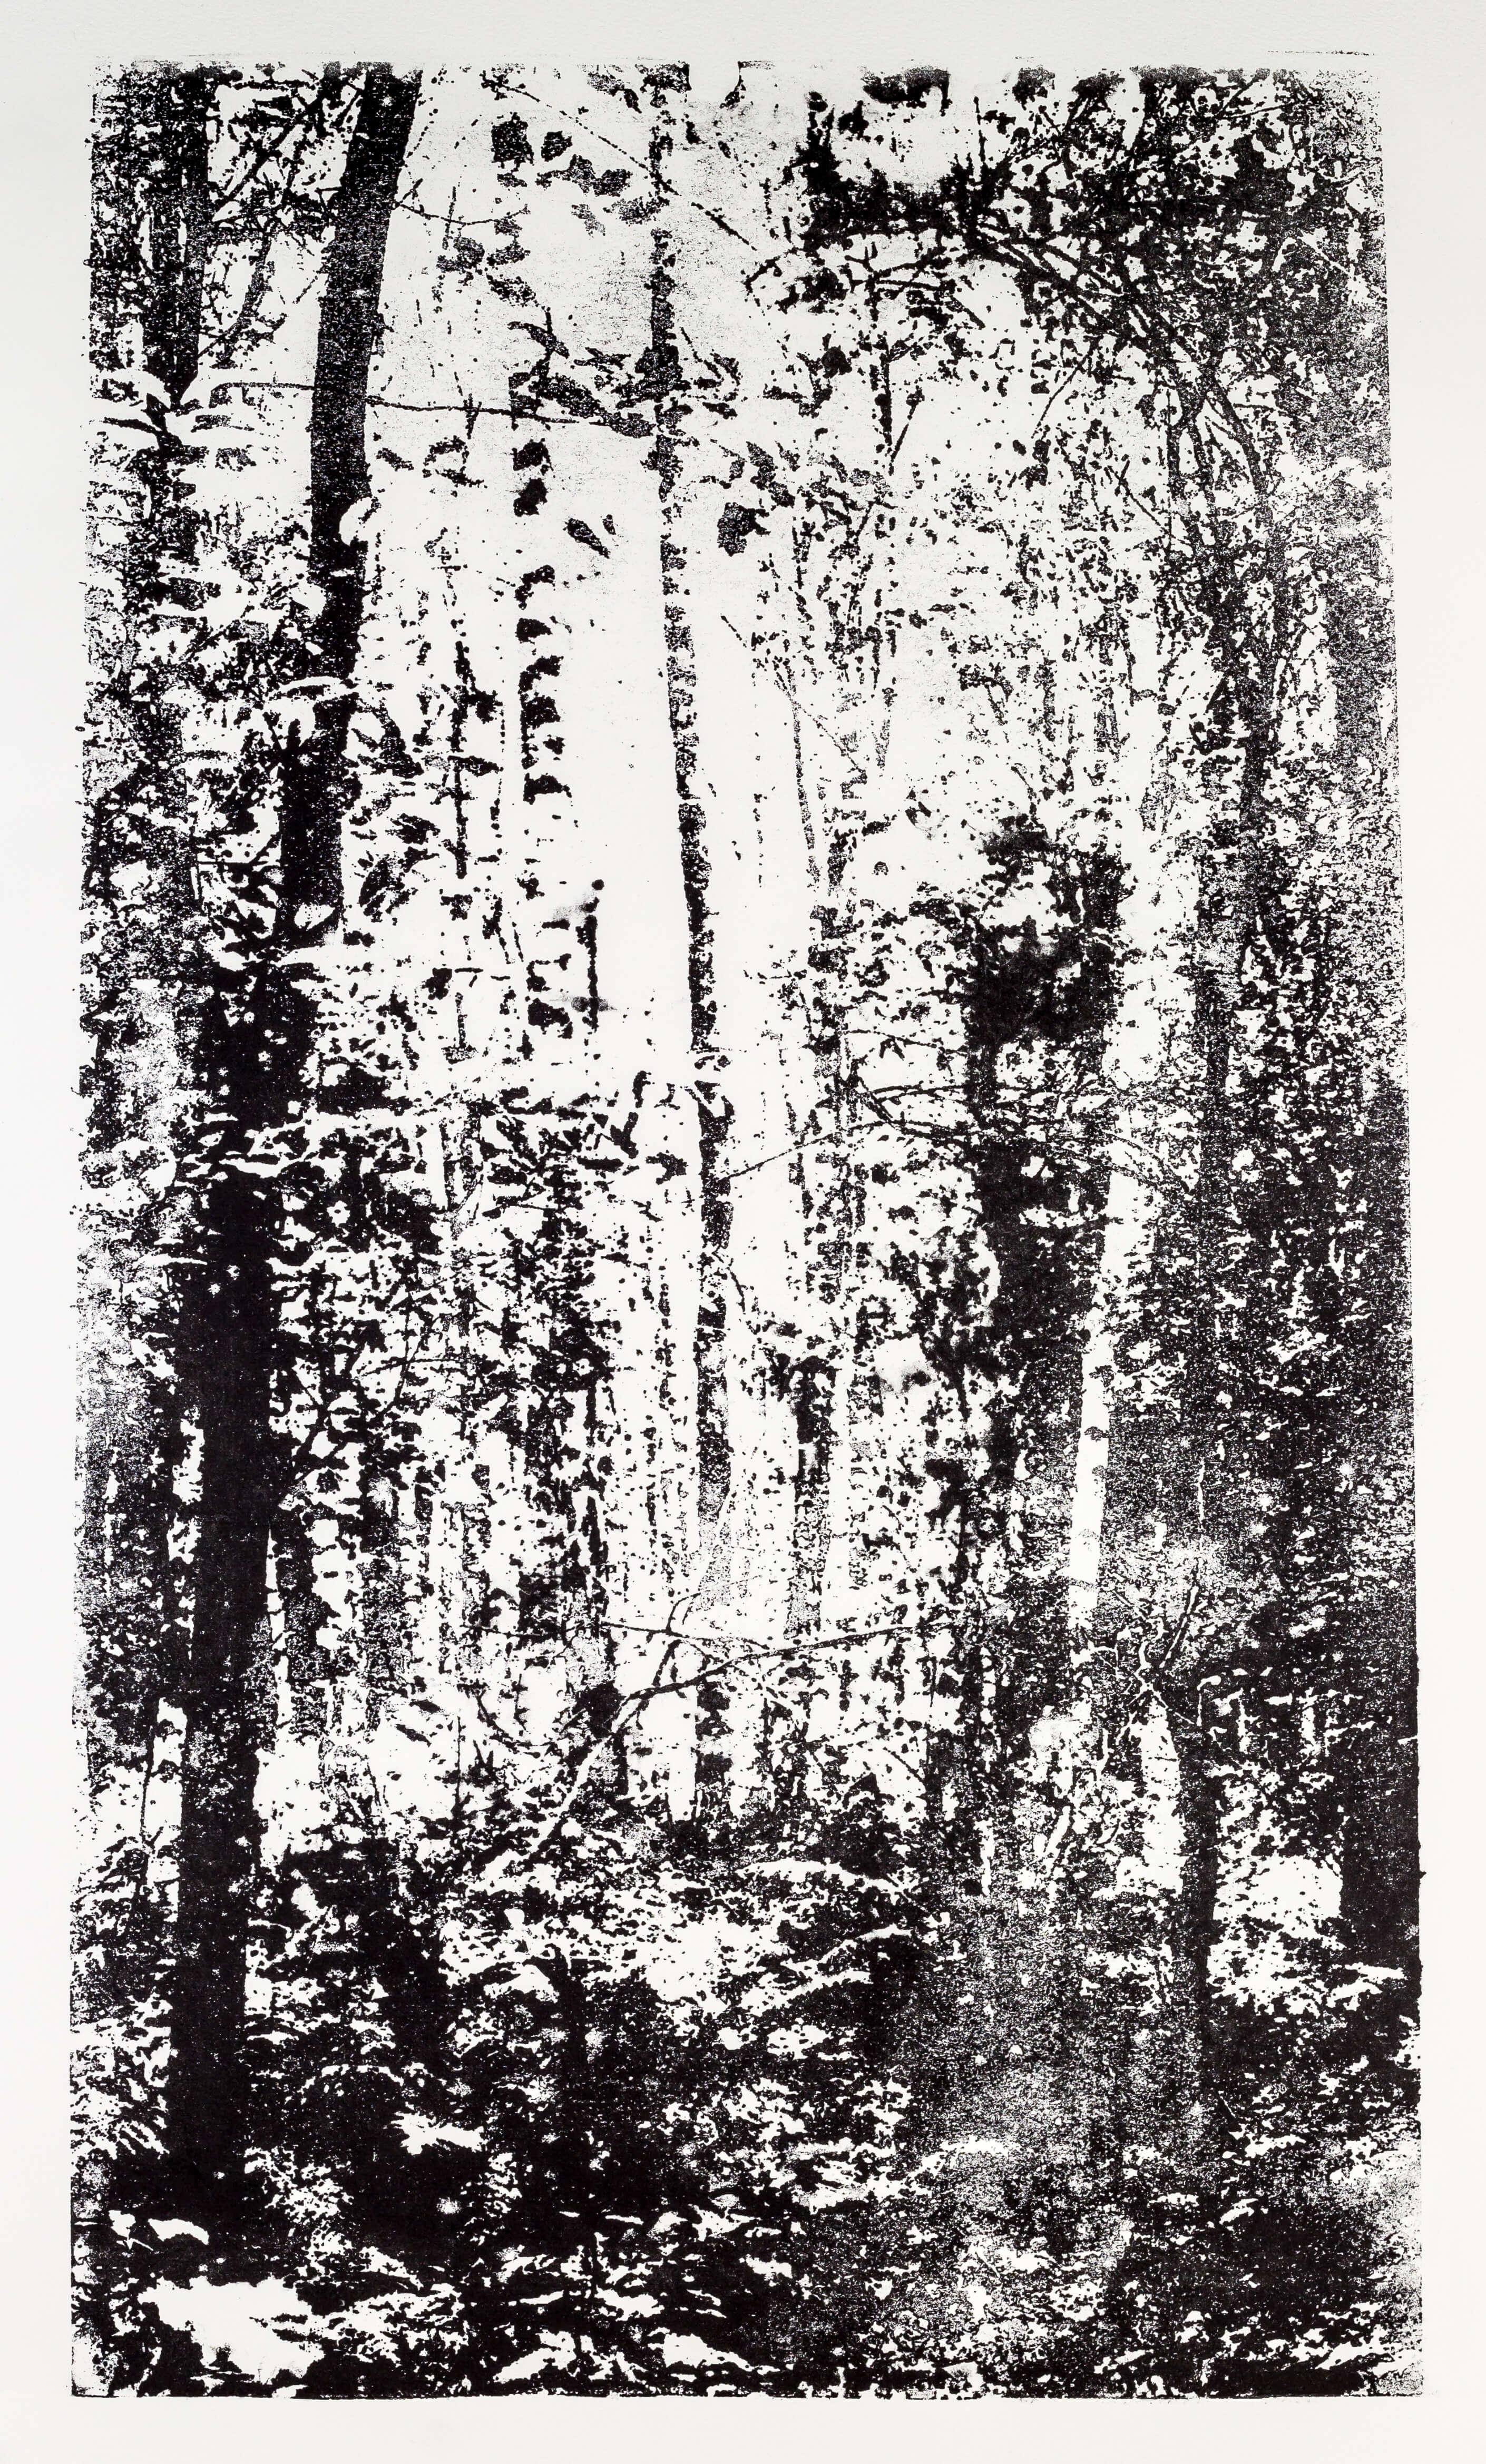 Katharina Albers, Wald XX-I, 2015, Lithographie, Unikat, 60×33 cm